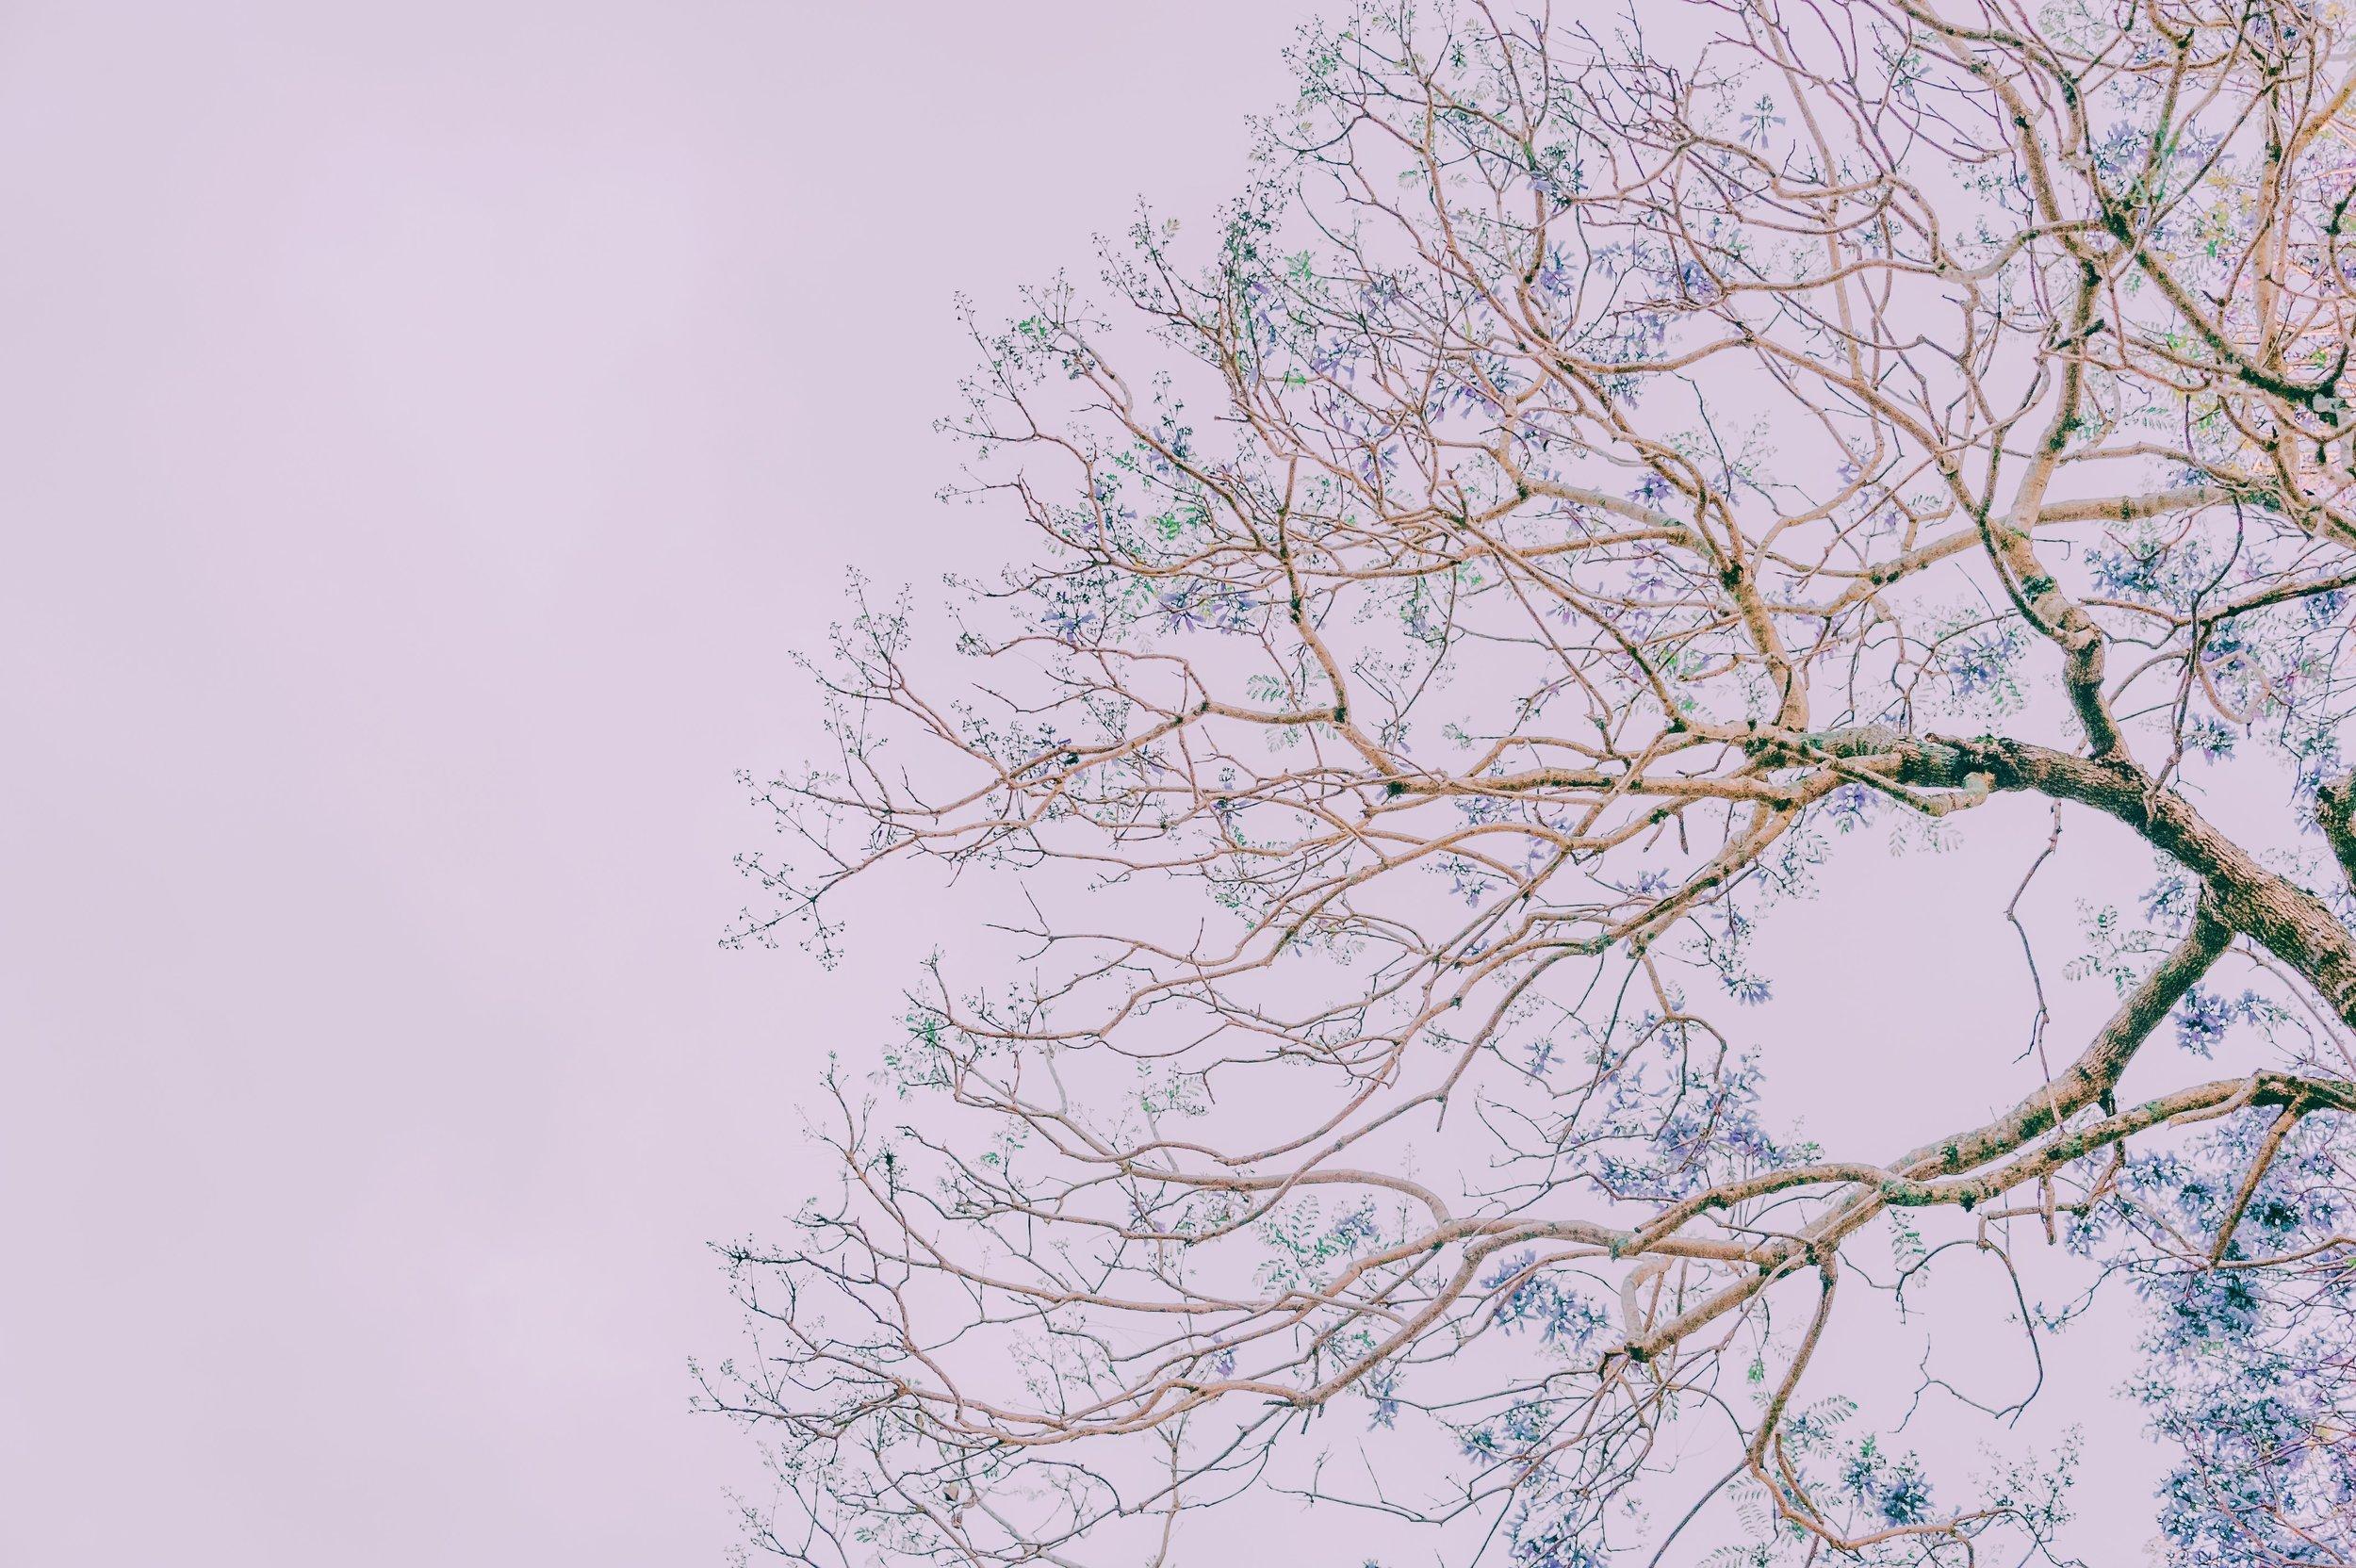 branches-desktop-backgrounds-free-wallpaper-1406866.jpg